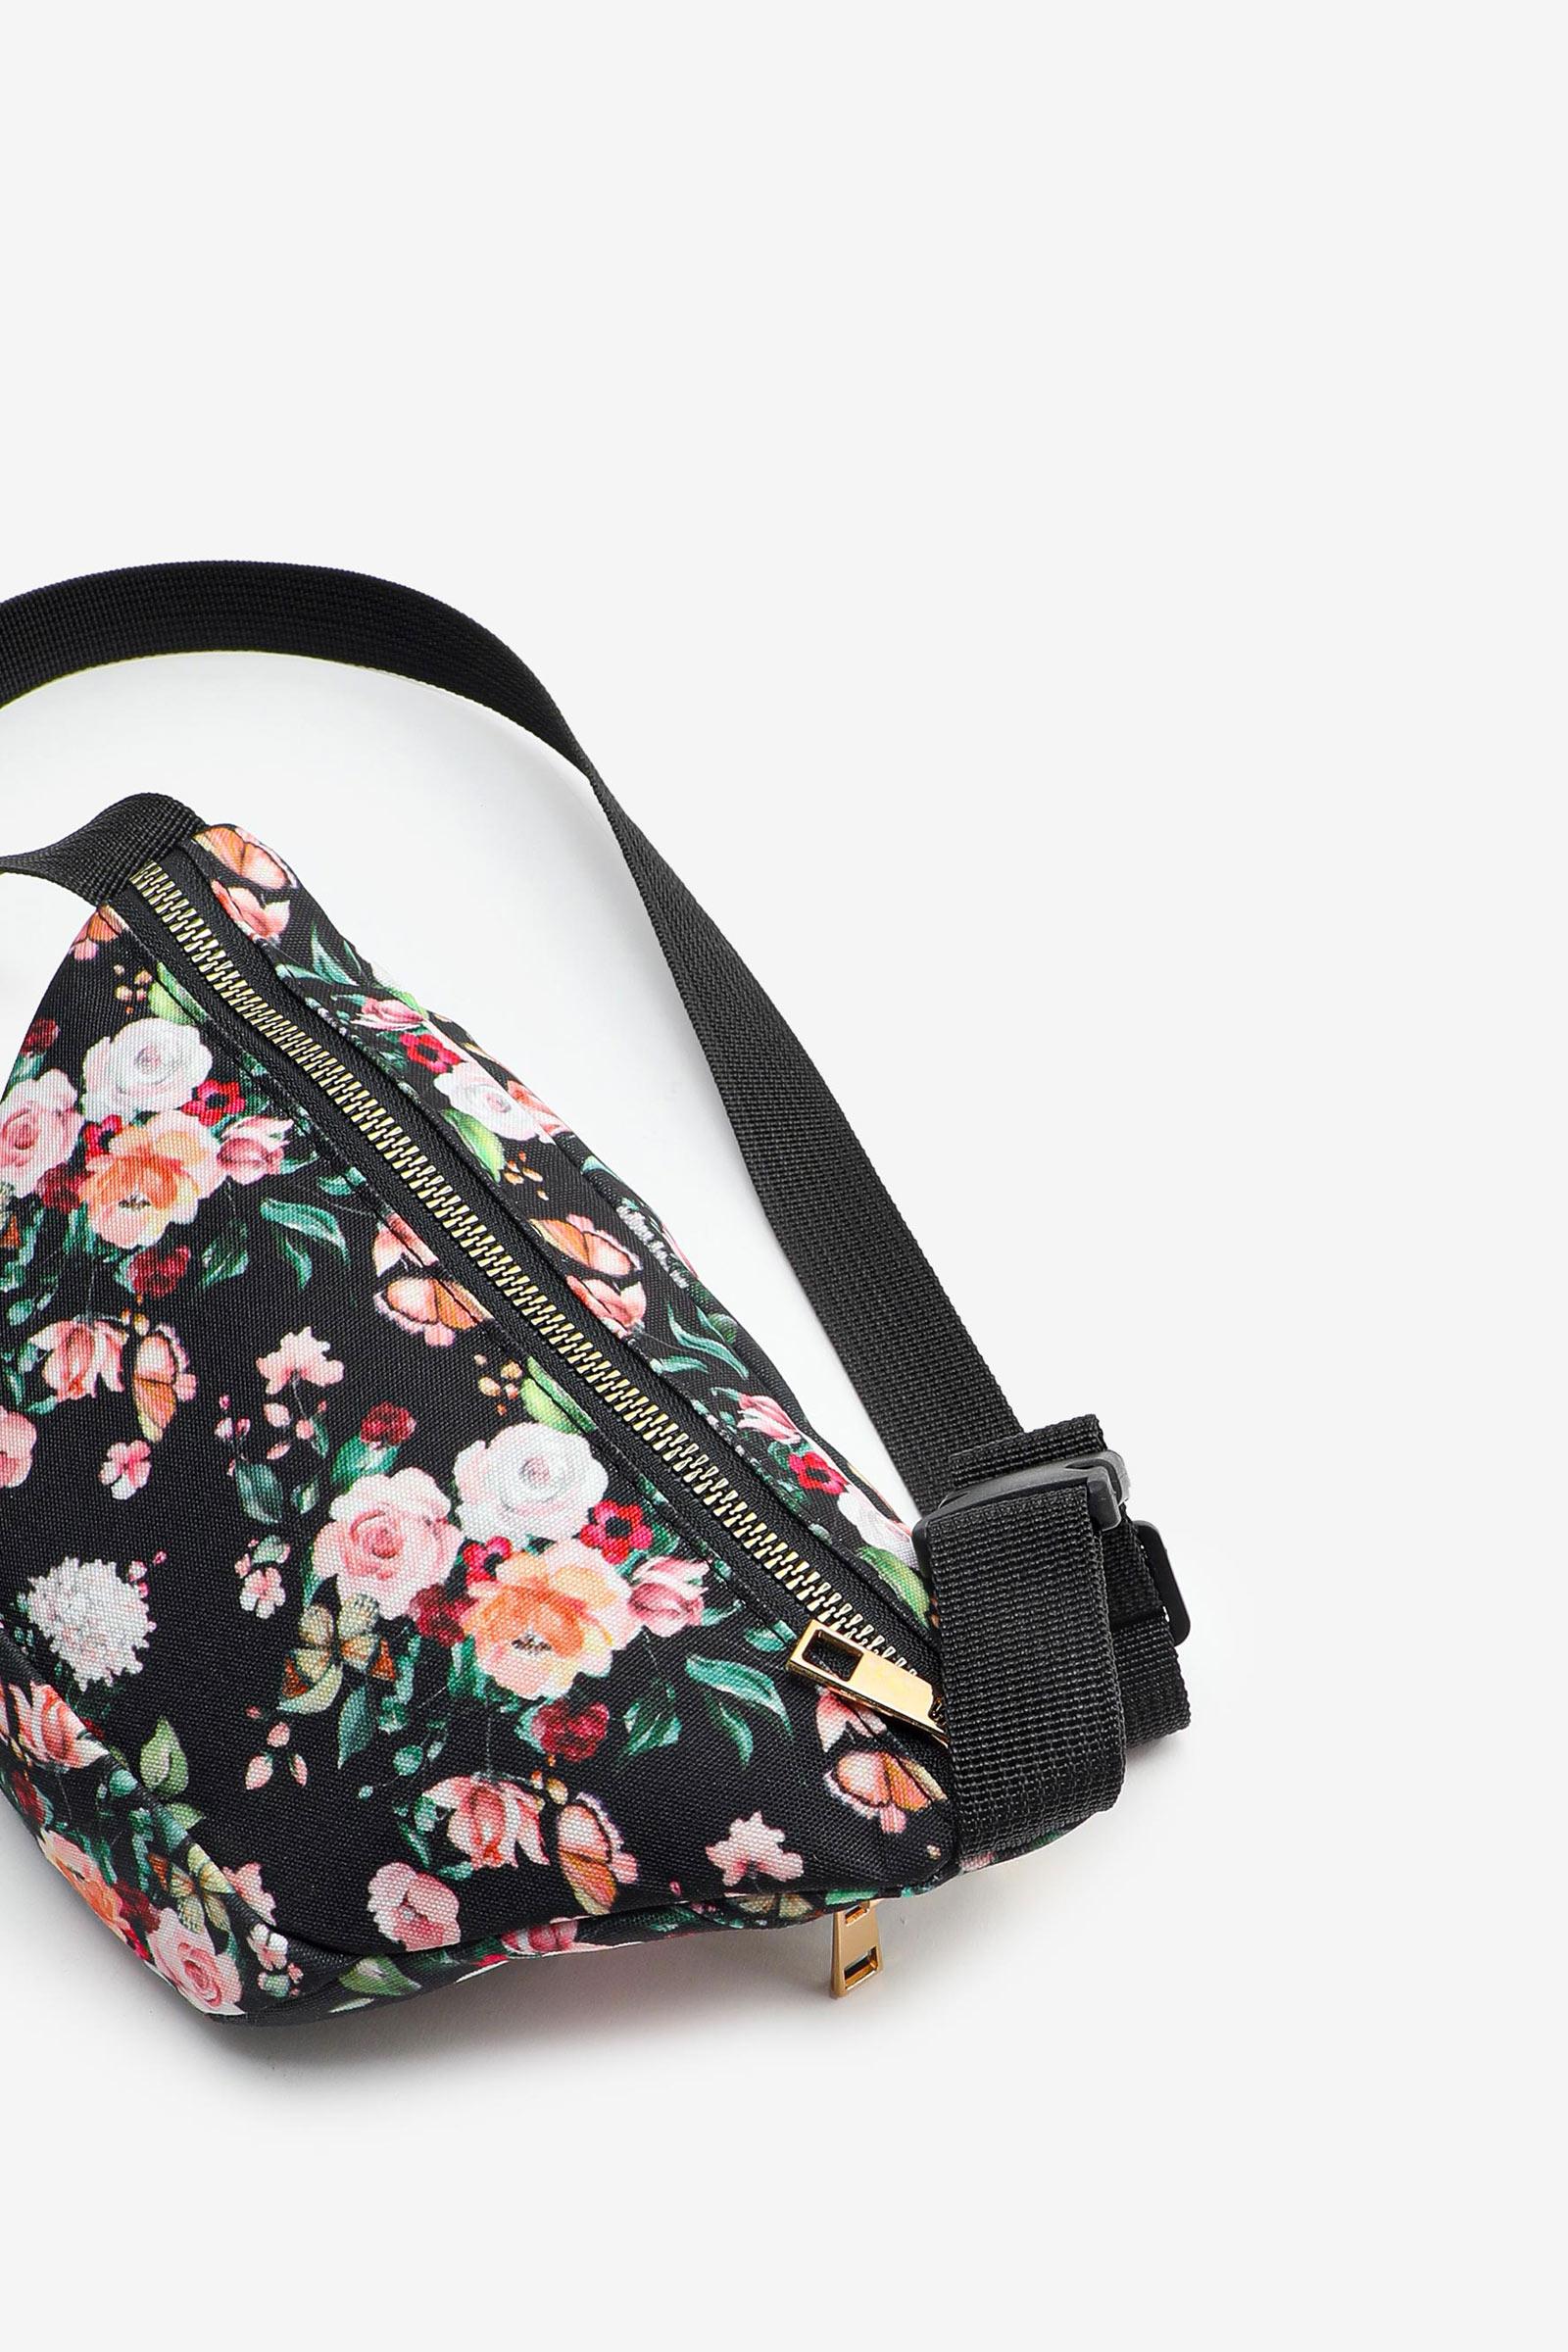 Floral Double-Zipper Fanny Pack